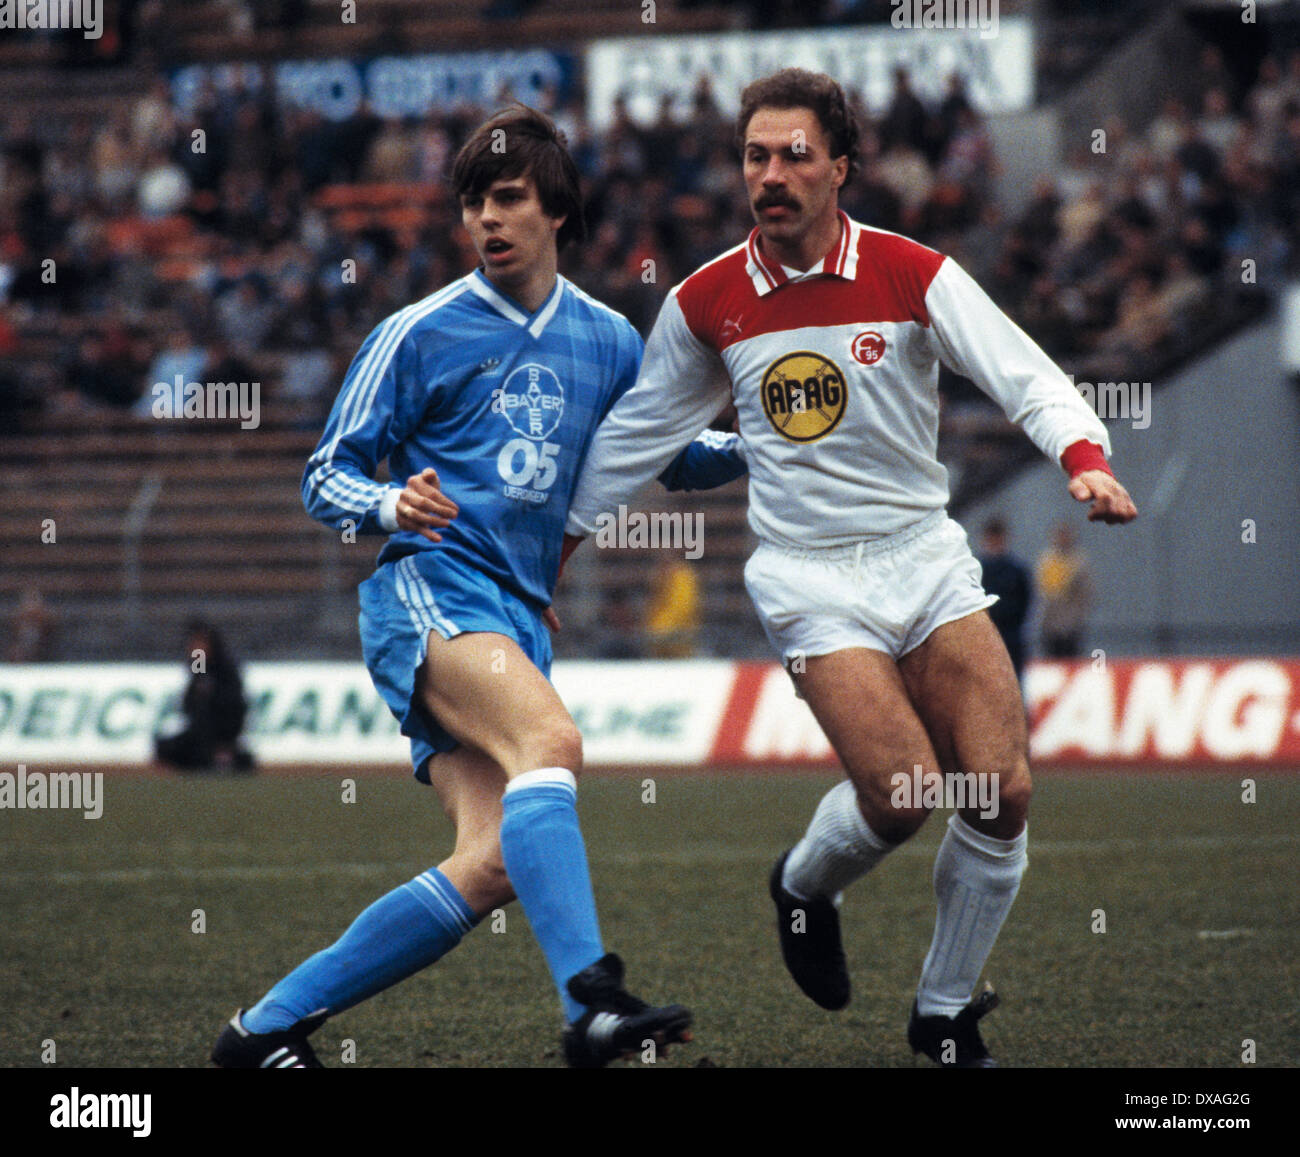 football, Bundesliga, 1984/1985, Rhine Stadium, Fortuna Duesseldorf versus FC Bayer 05 Uerdingen 2:2, scene of the match, Larus Gudmundsson (Bayer) left and Peter Loehr (Fortuna) - Stock Image